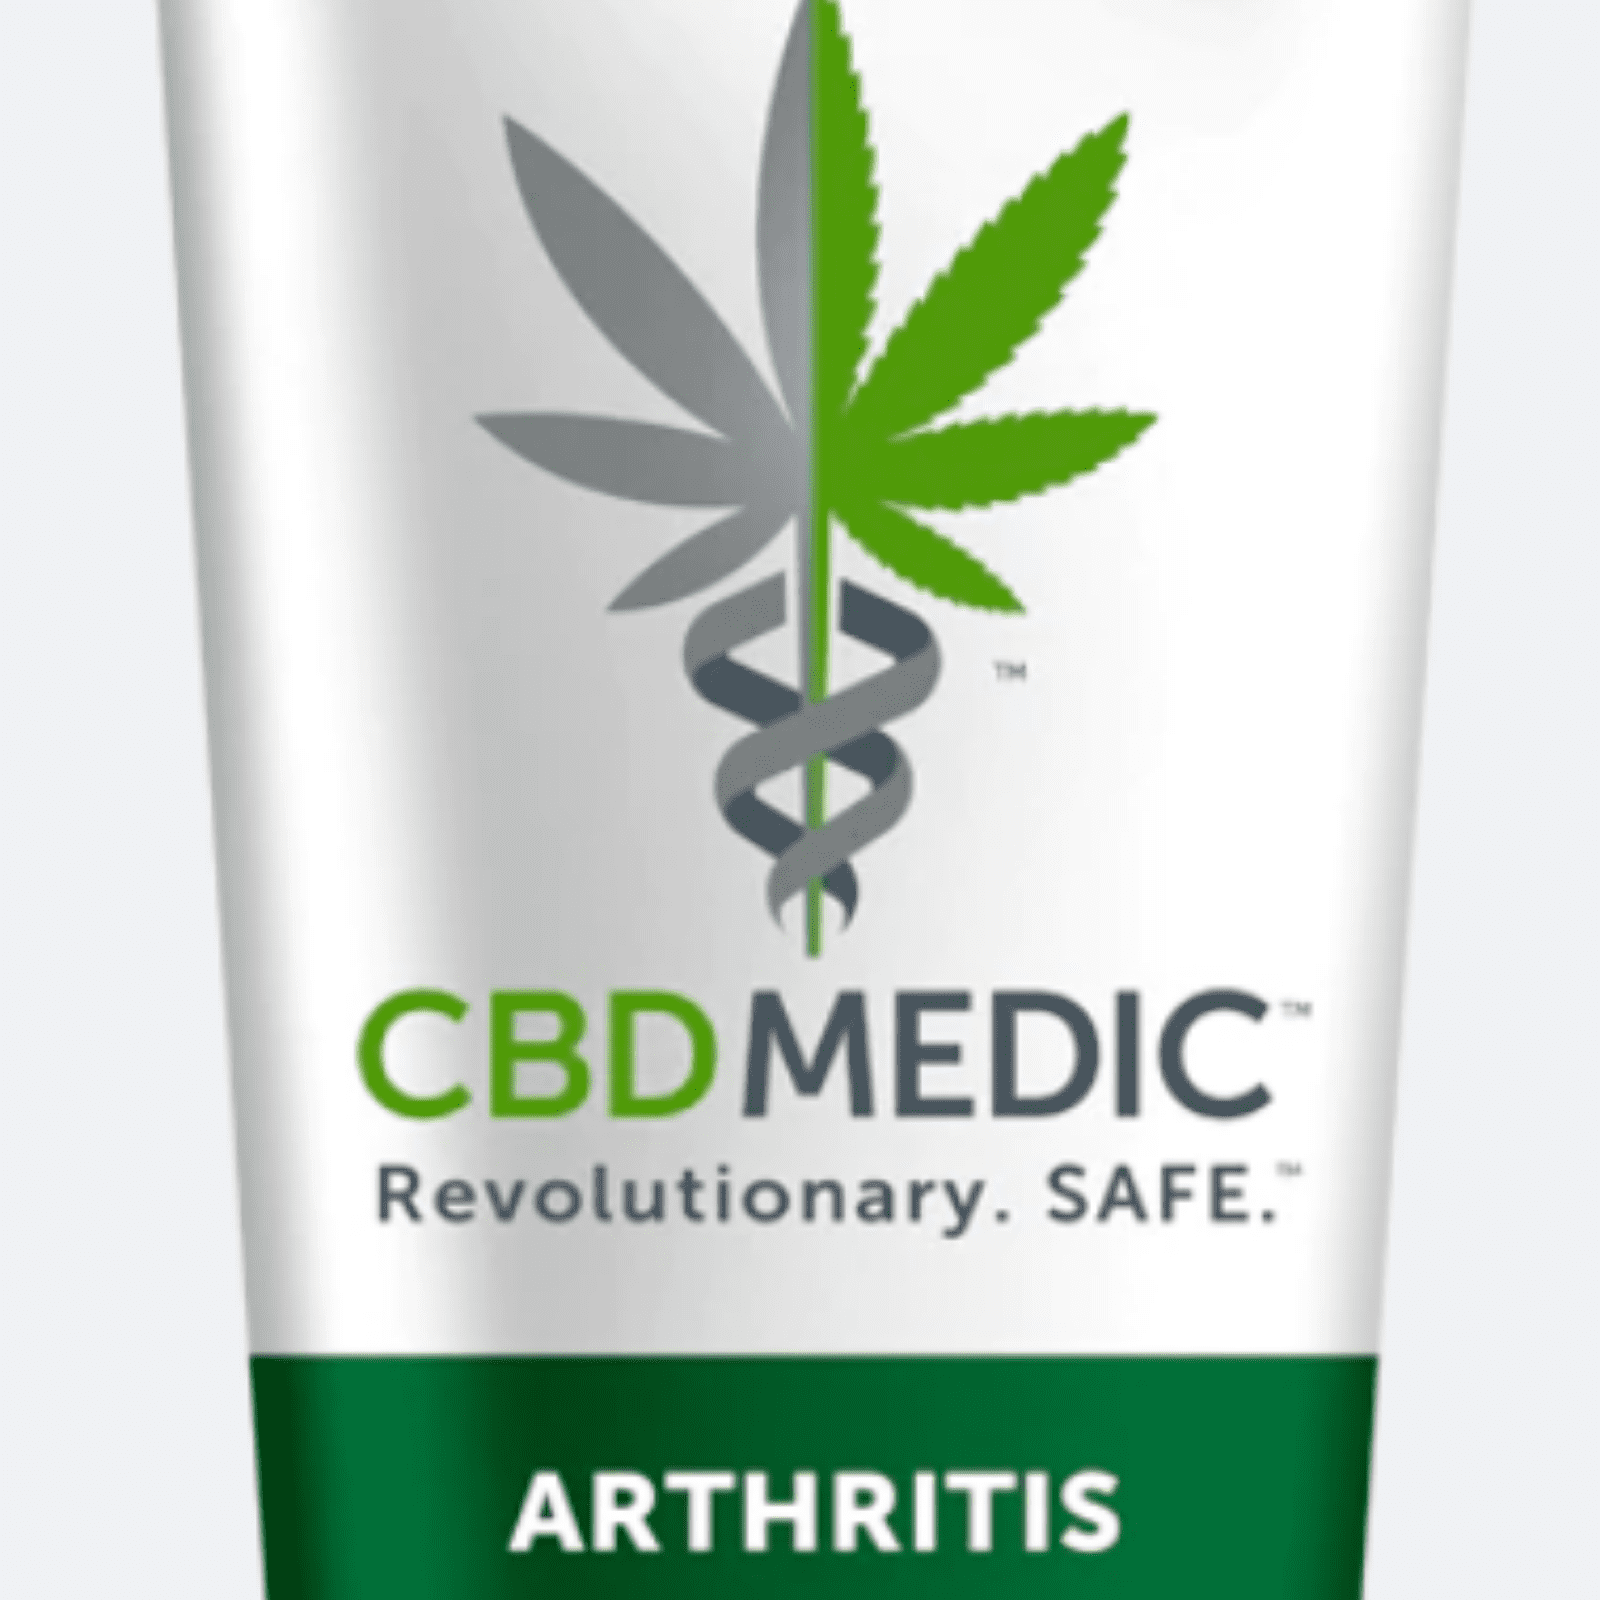 CBDMEDIC Arthritis Ointment